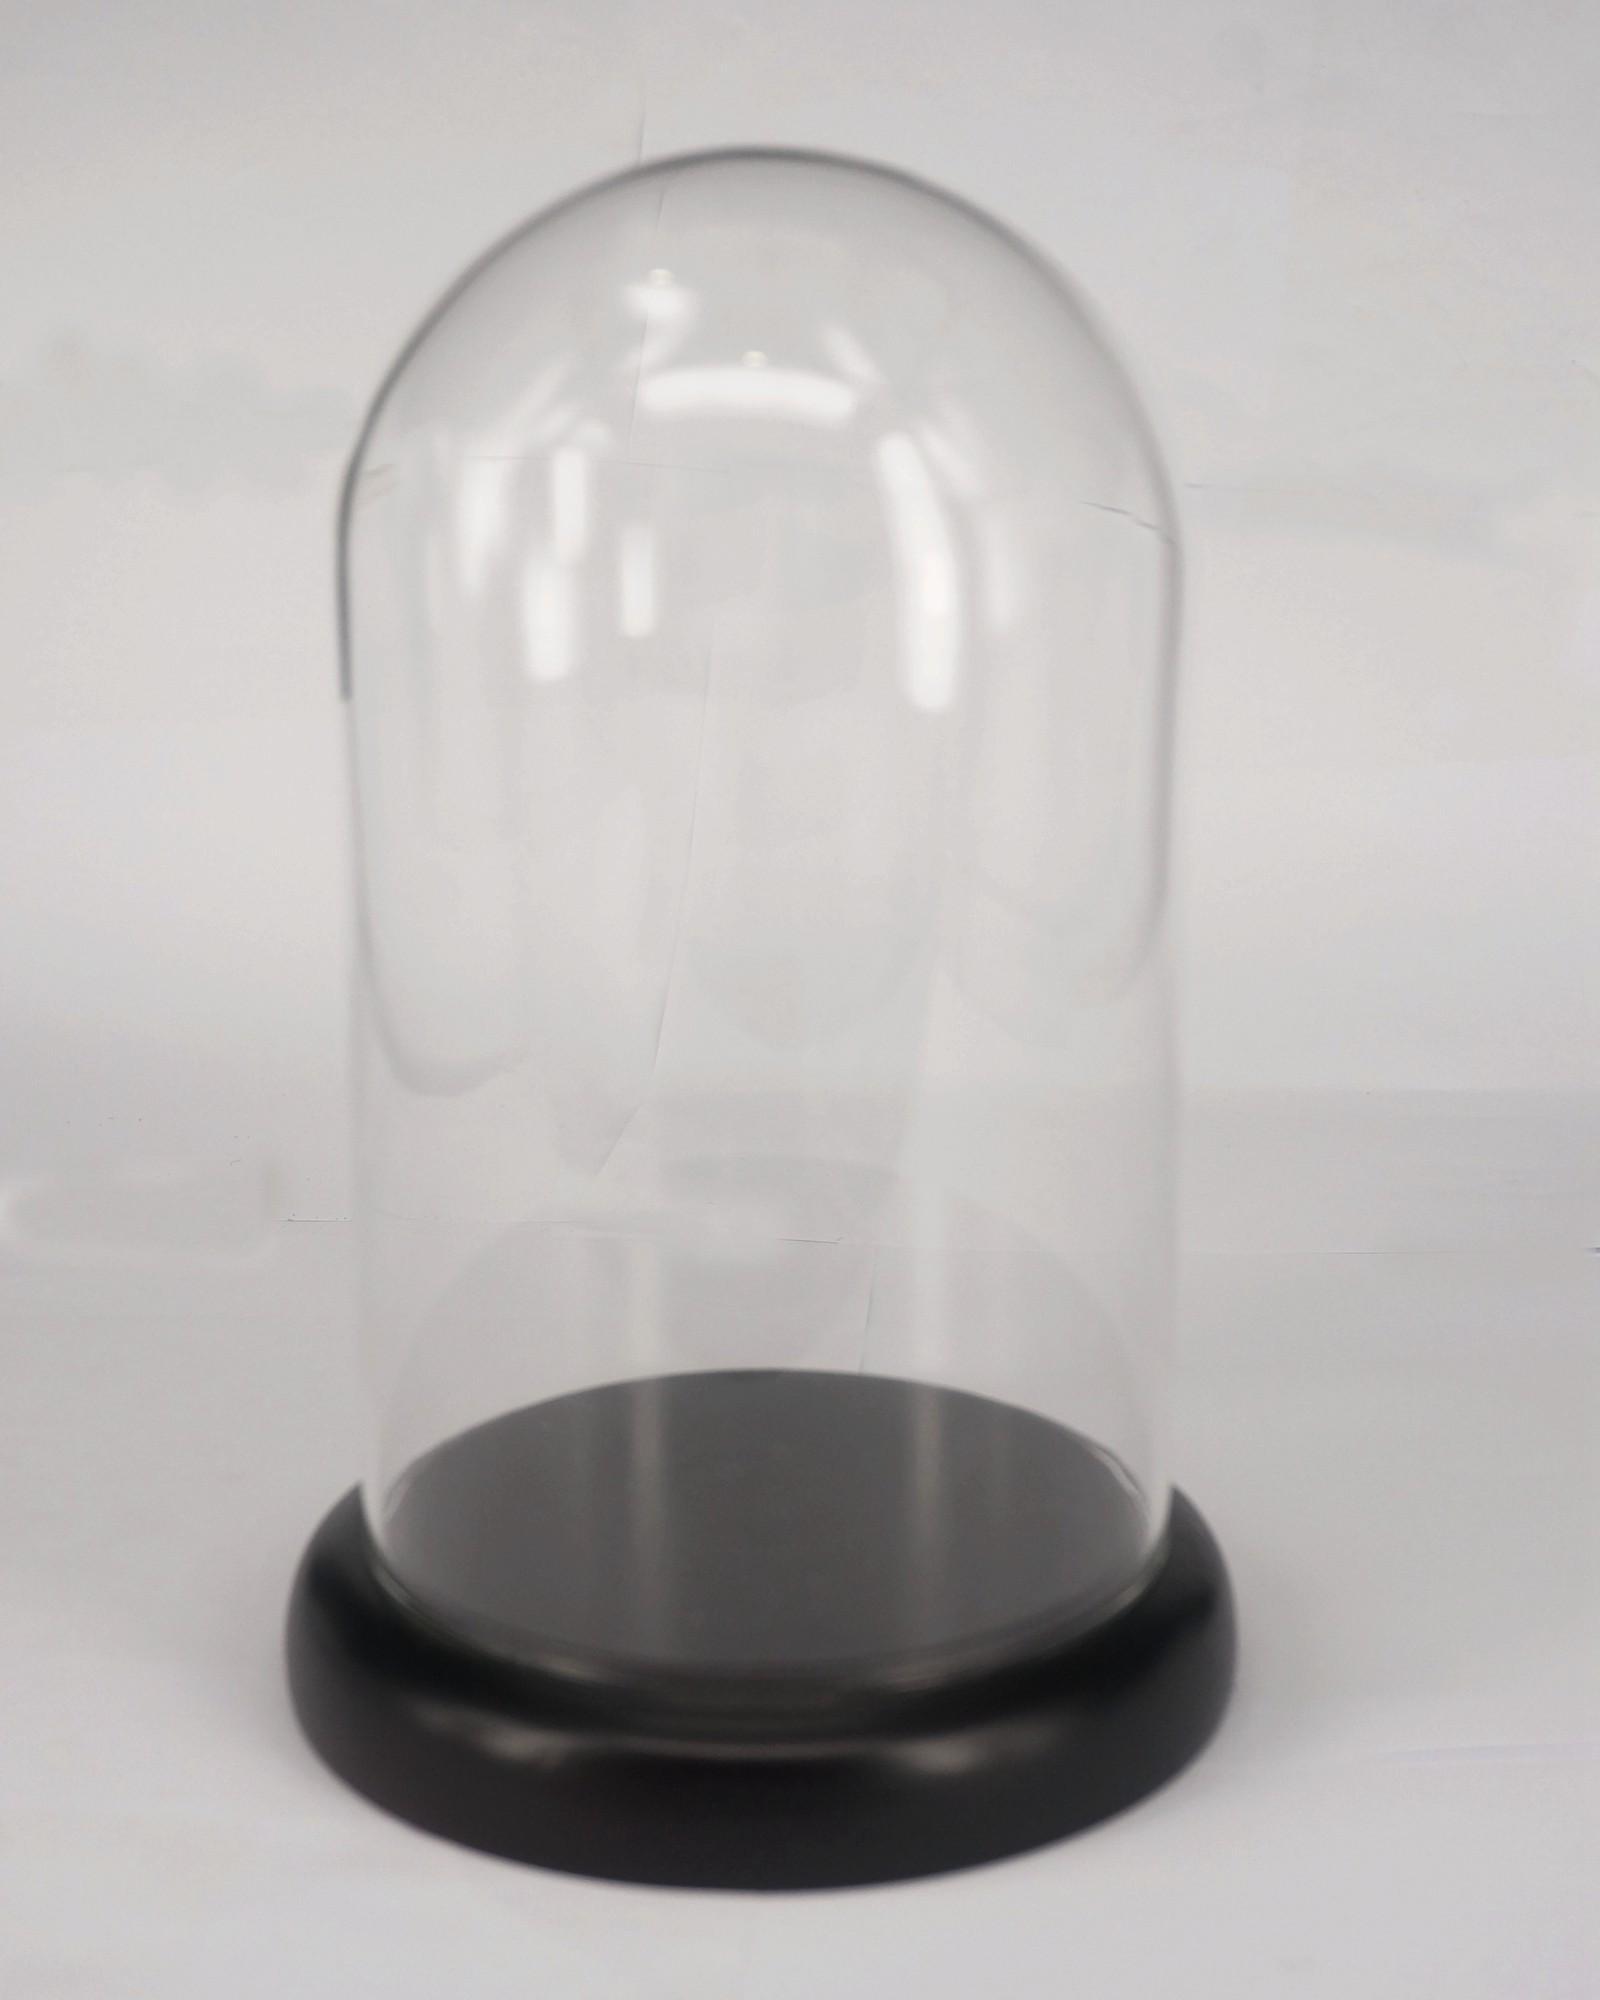 Medium Of Glass Dome Display